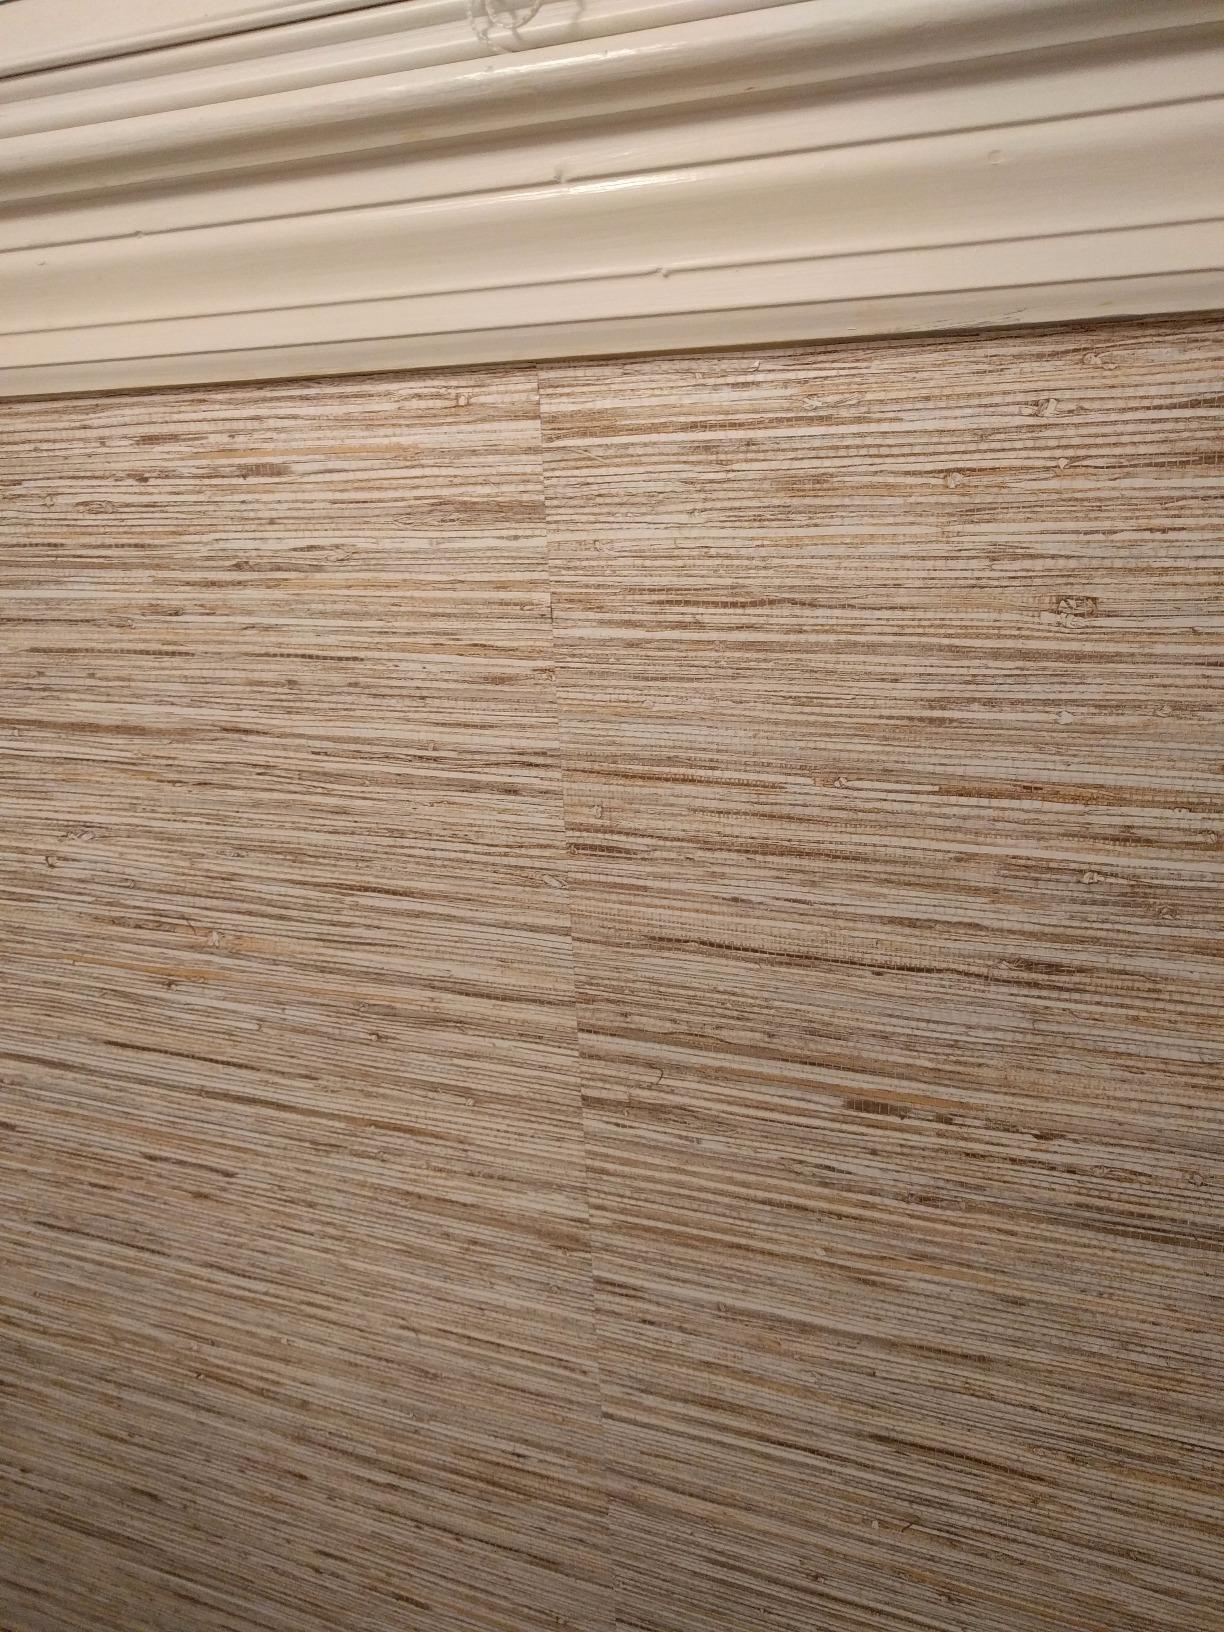 Roommates Grasscloth Peel And Stick Wallpaper Amazon Com Grasscloth Peel And Stick Wallpaper Wallpaper